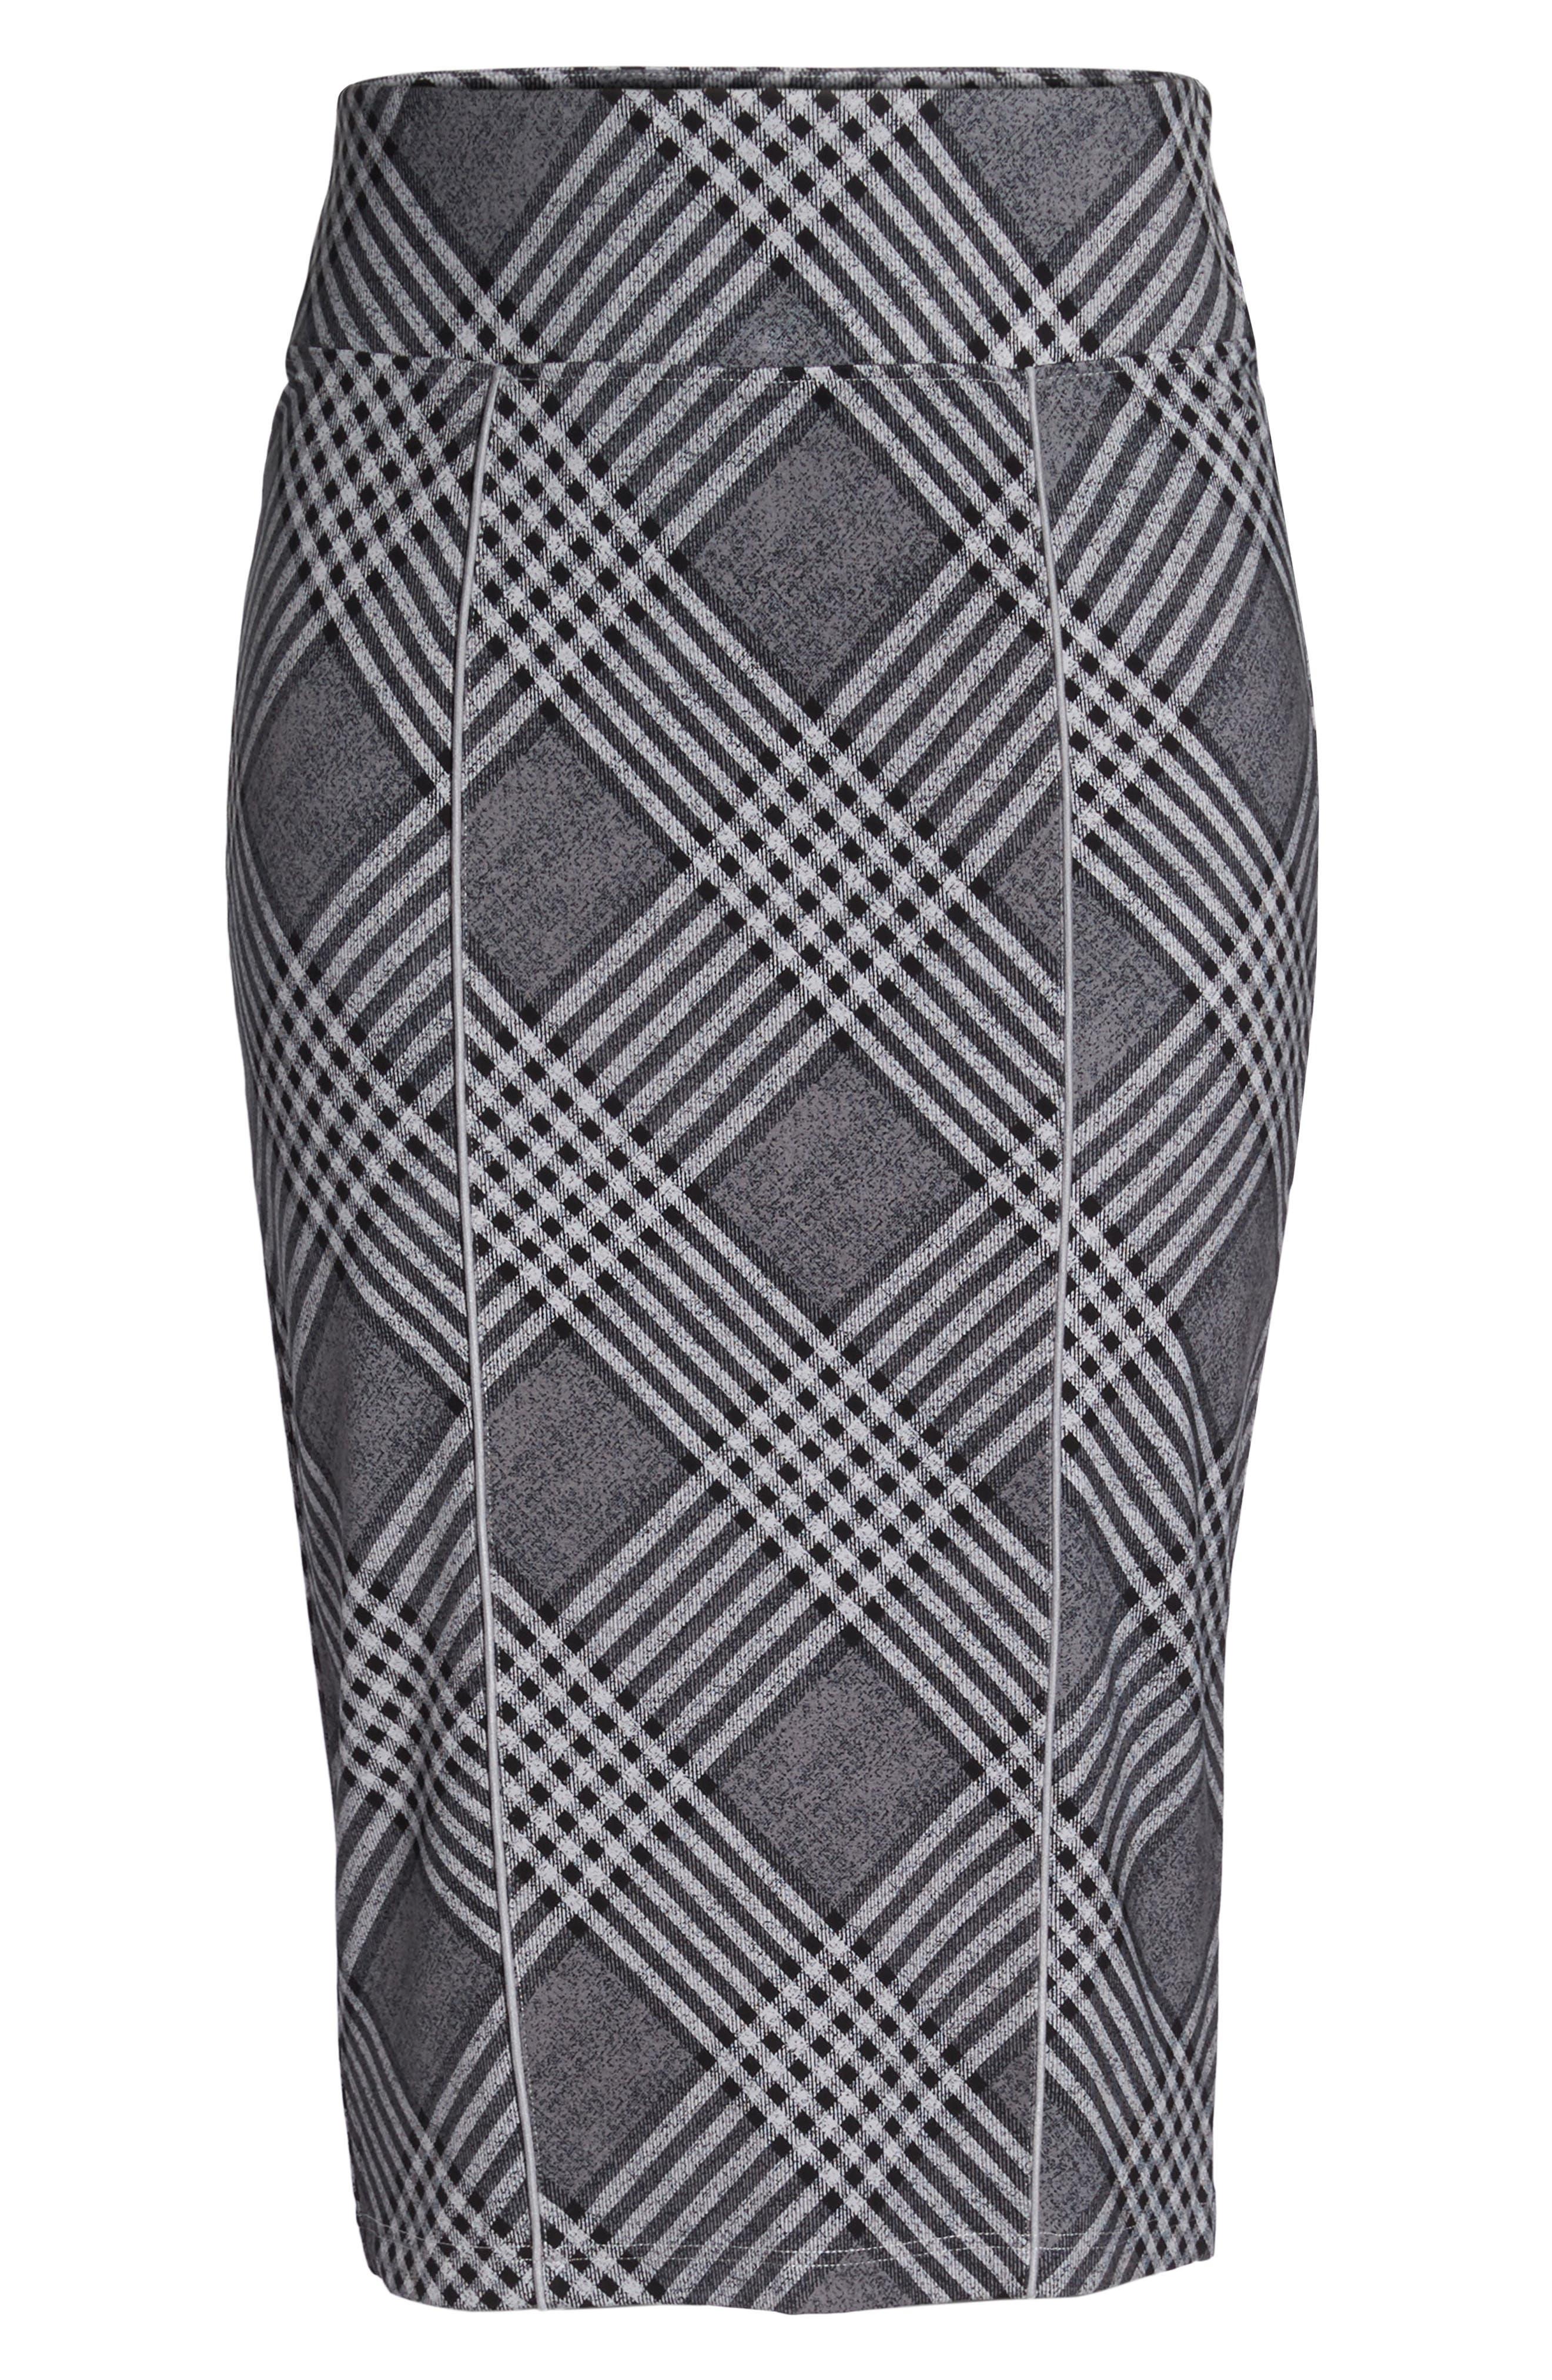 Plaid Pencil Skirt,                             Alternate thumbnail 6, color,                             036